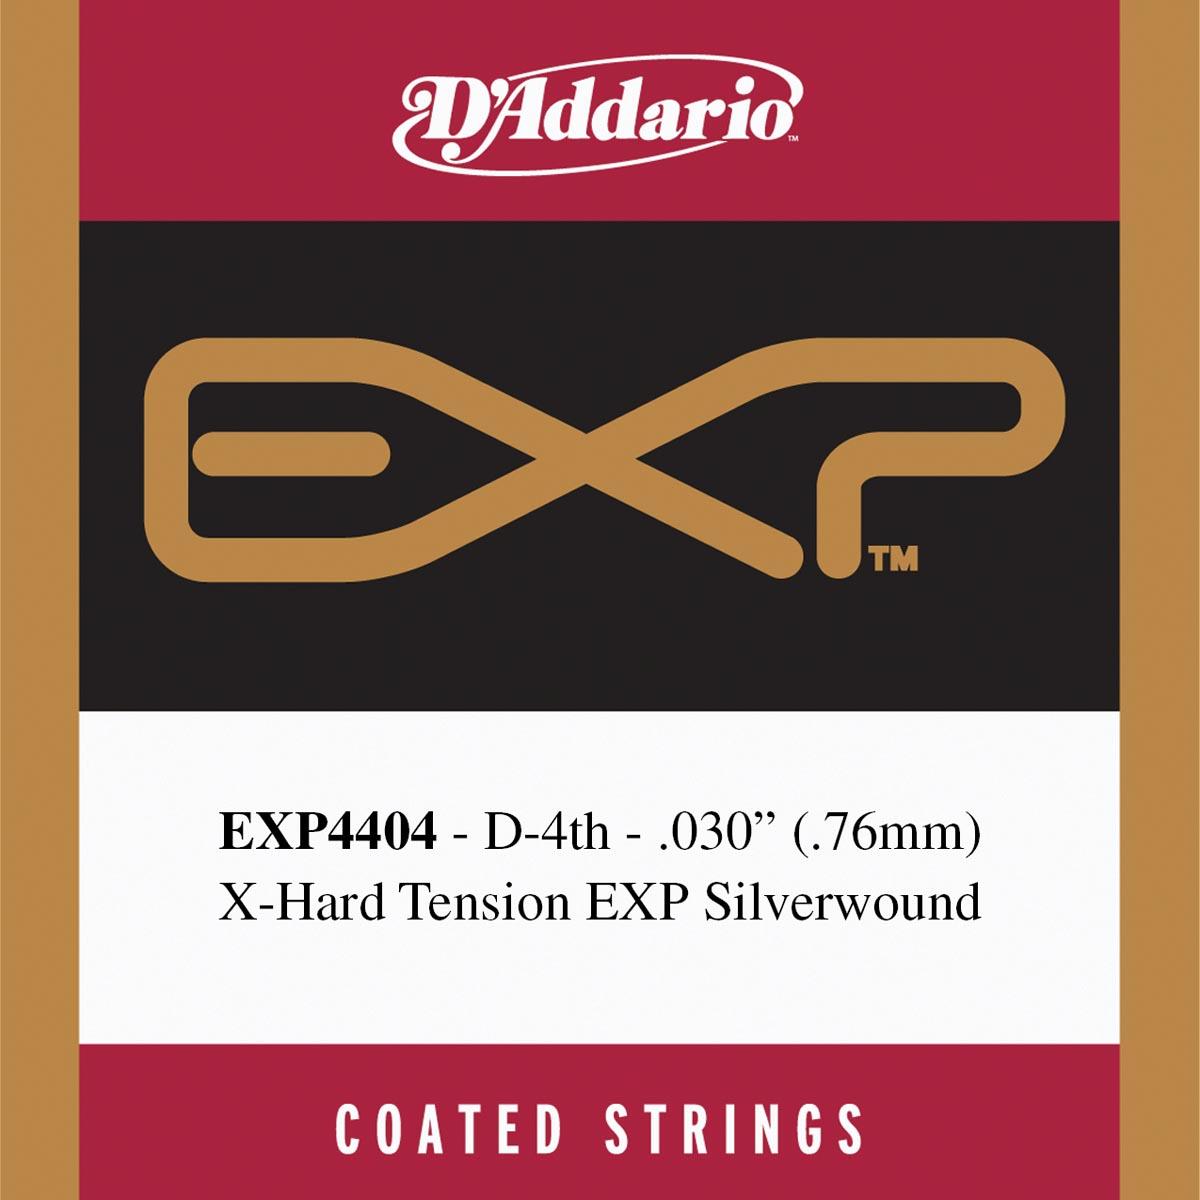 D'ADDARIO EXP4404